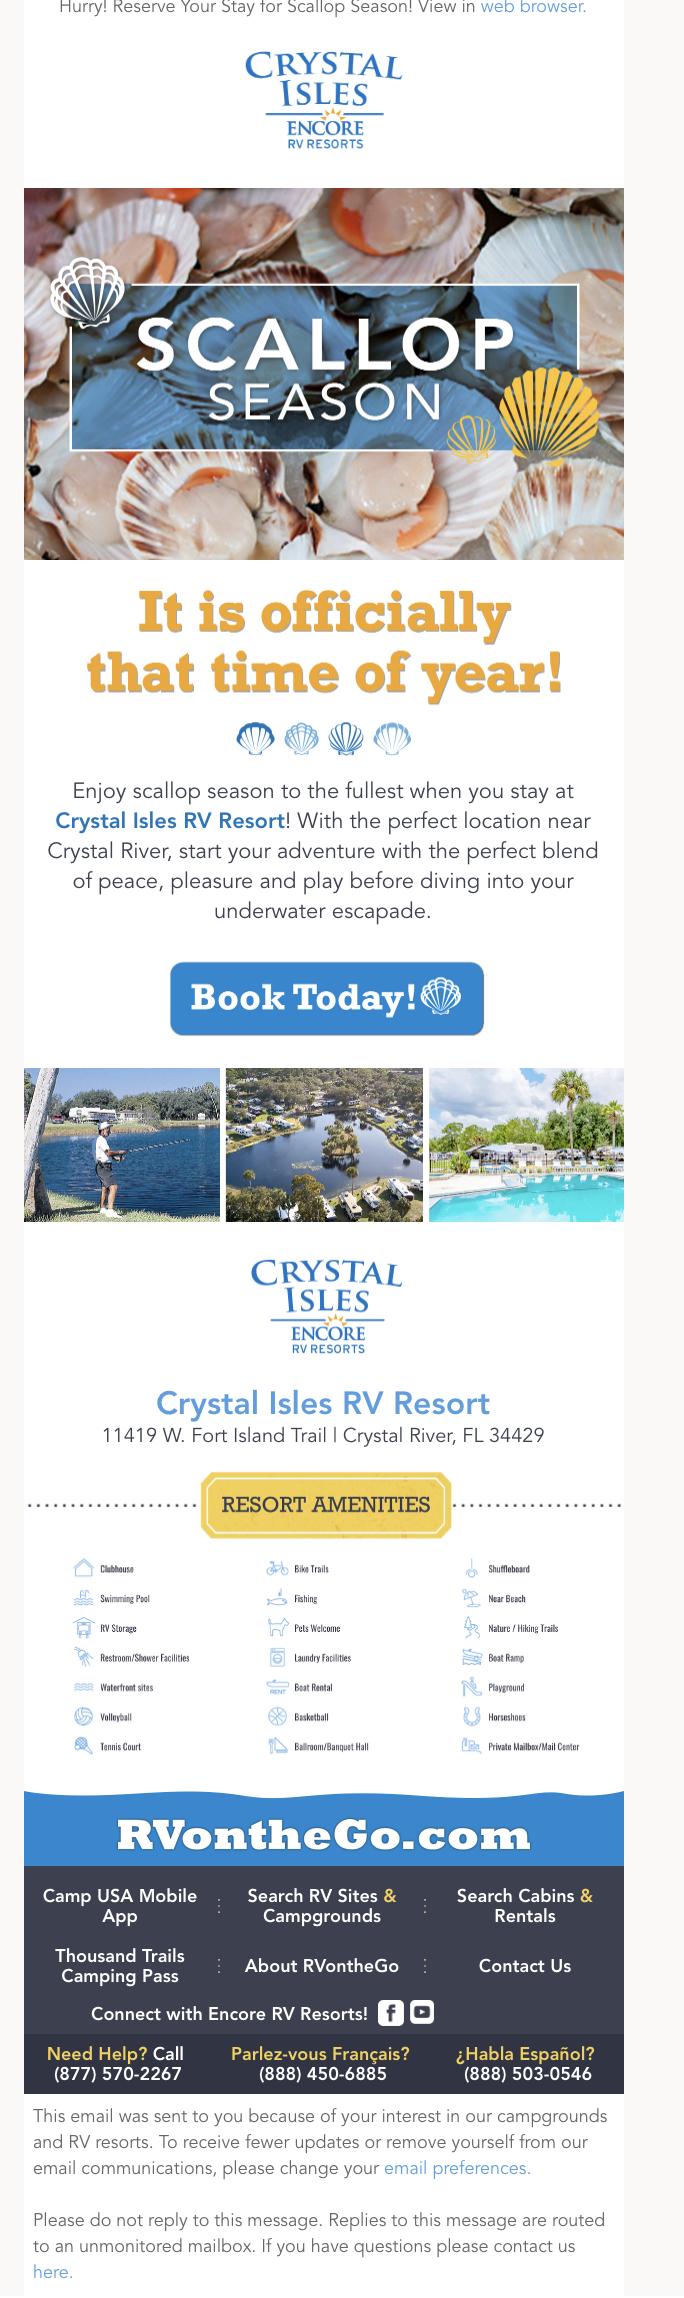 Pin By Susie Pusateri On Email Marketing Resort Enjoyment Adventure